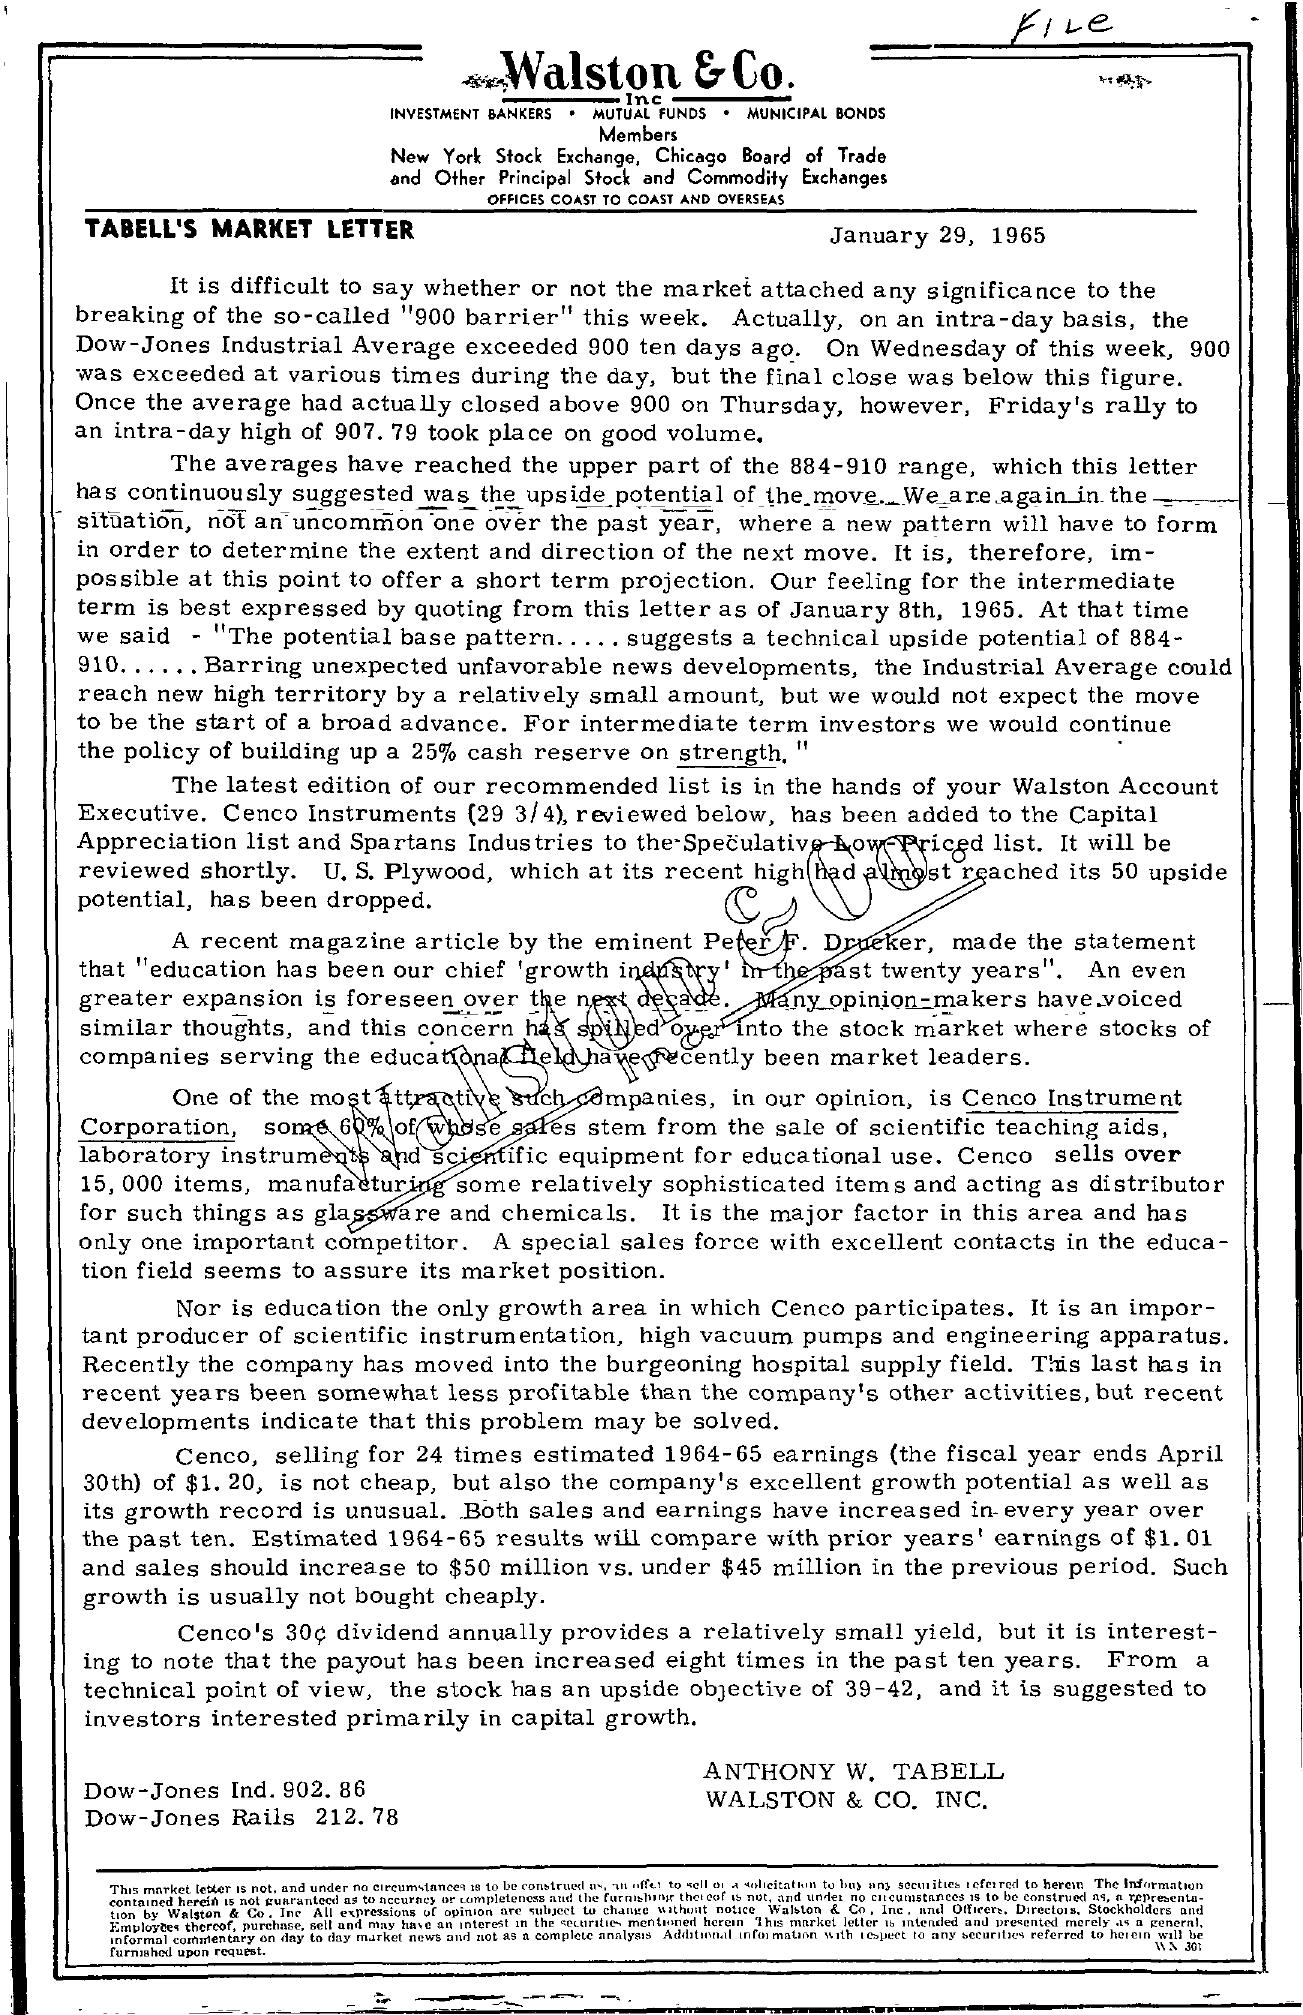 Tabell's Market Letter - January 29, 1965